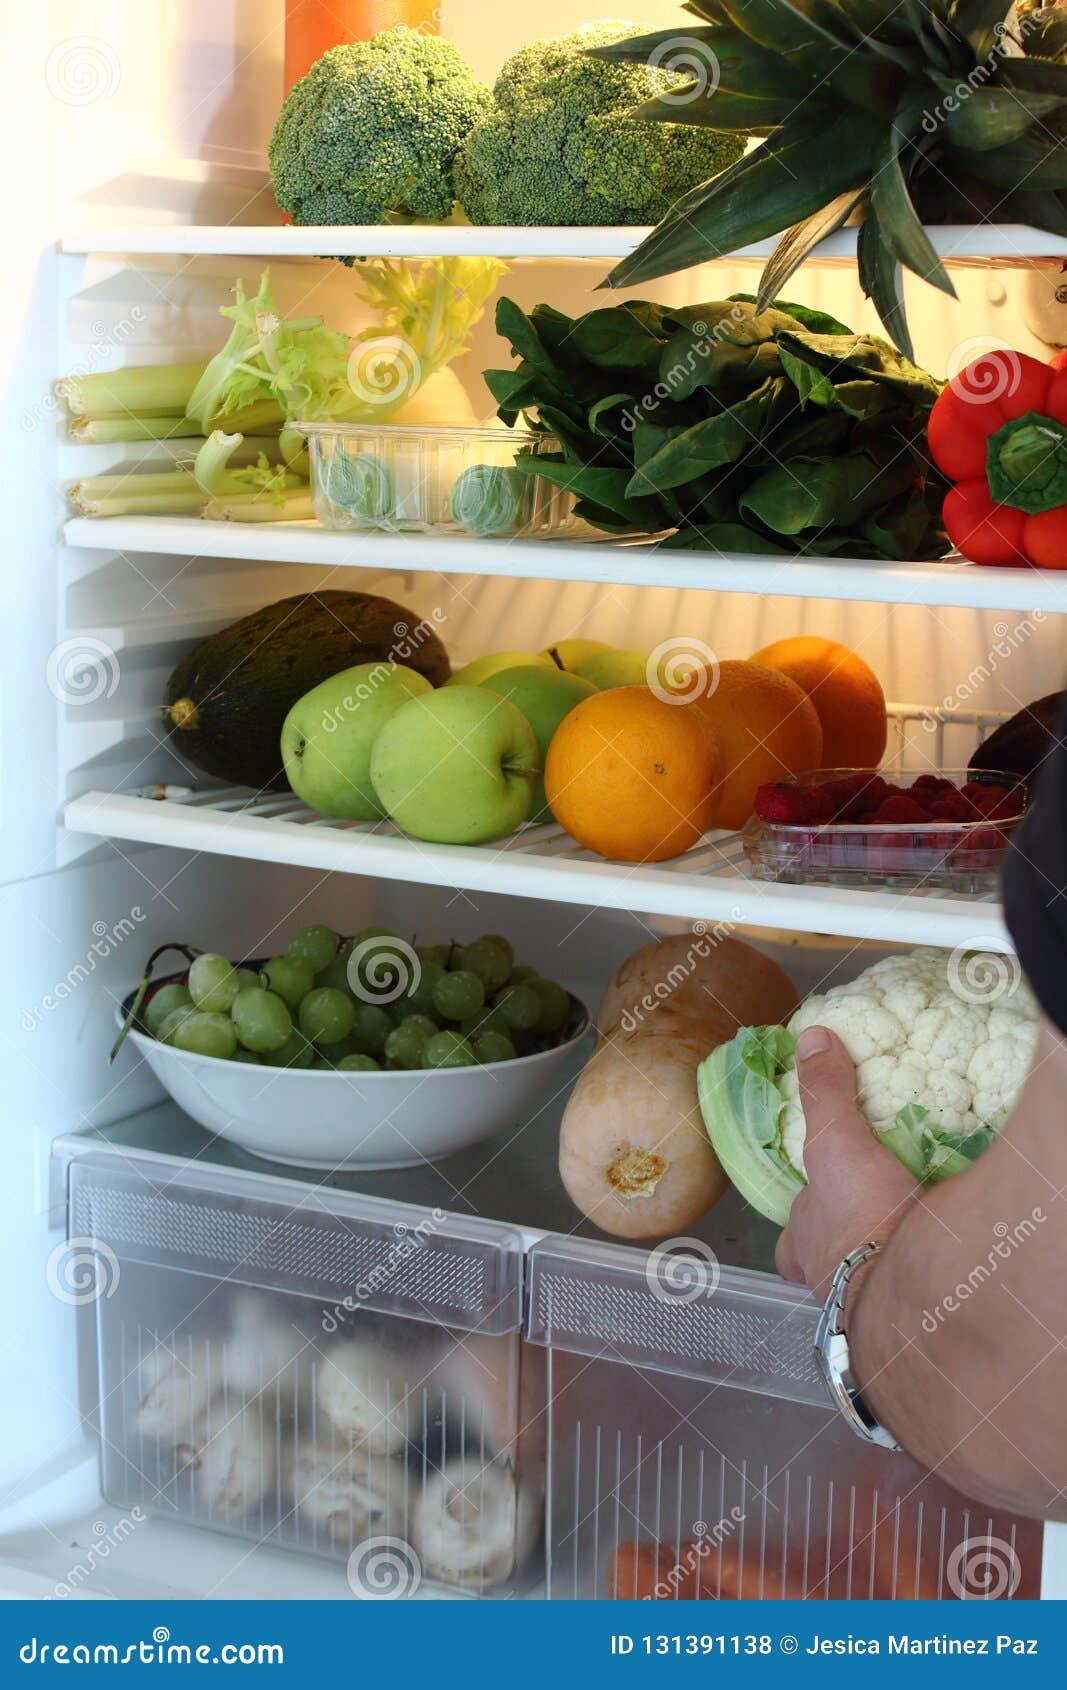 Open refrigerator full of healthy vegetarian food.